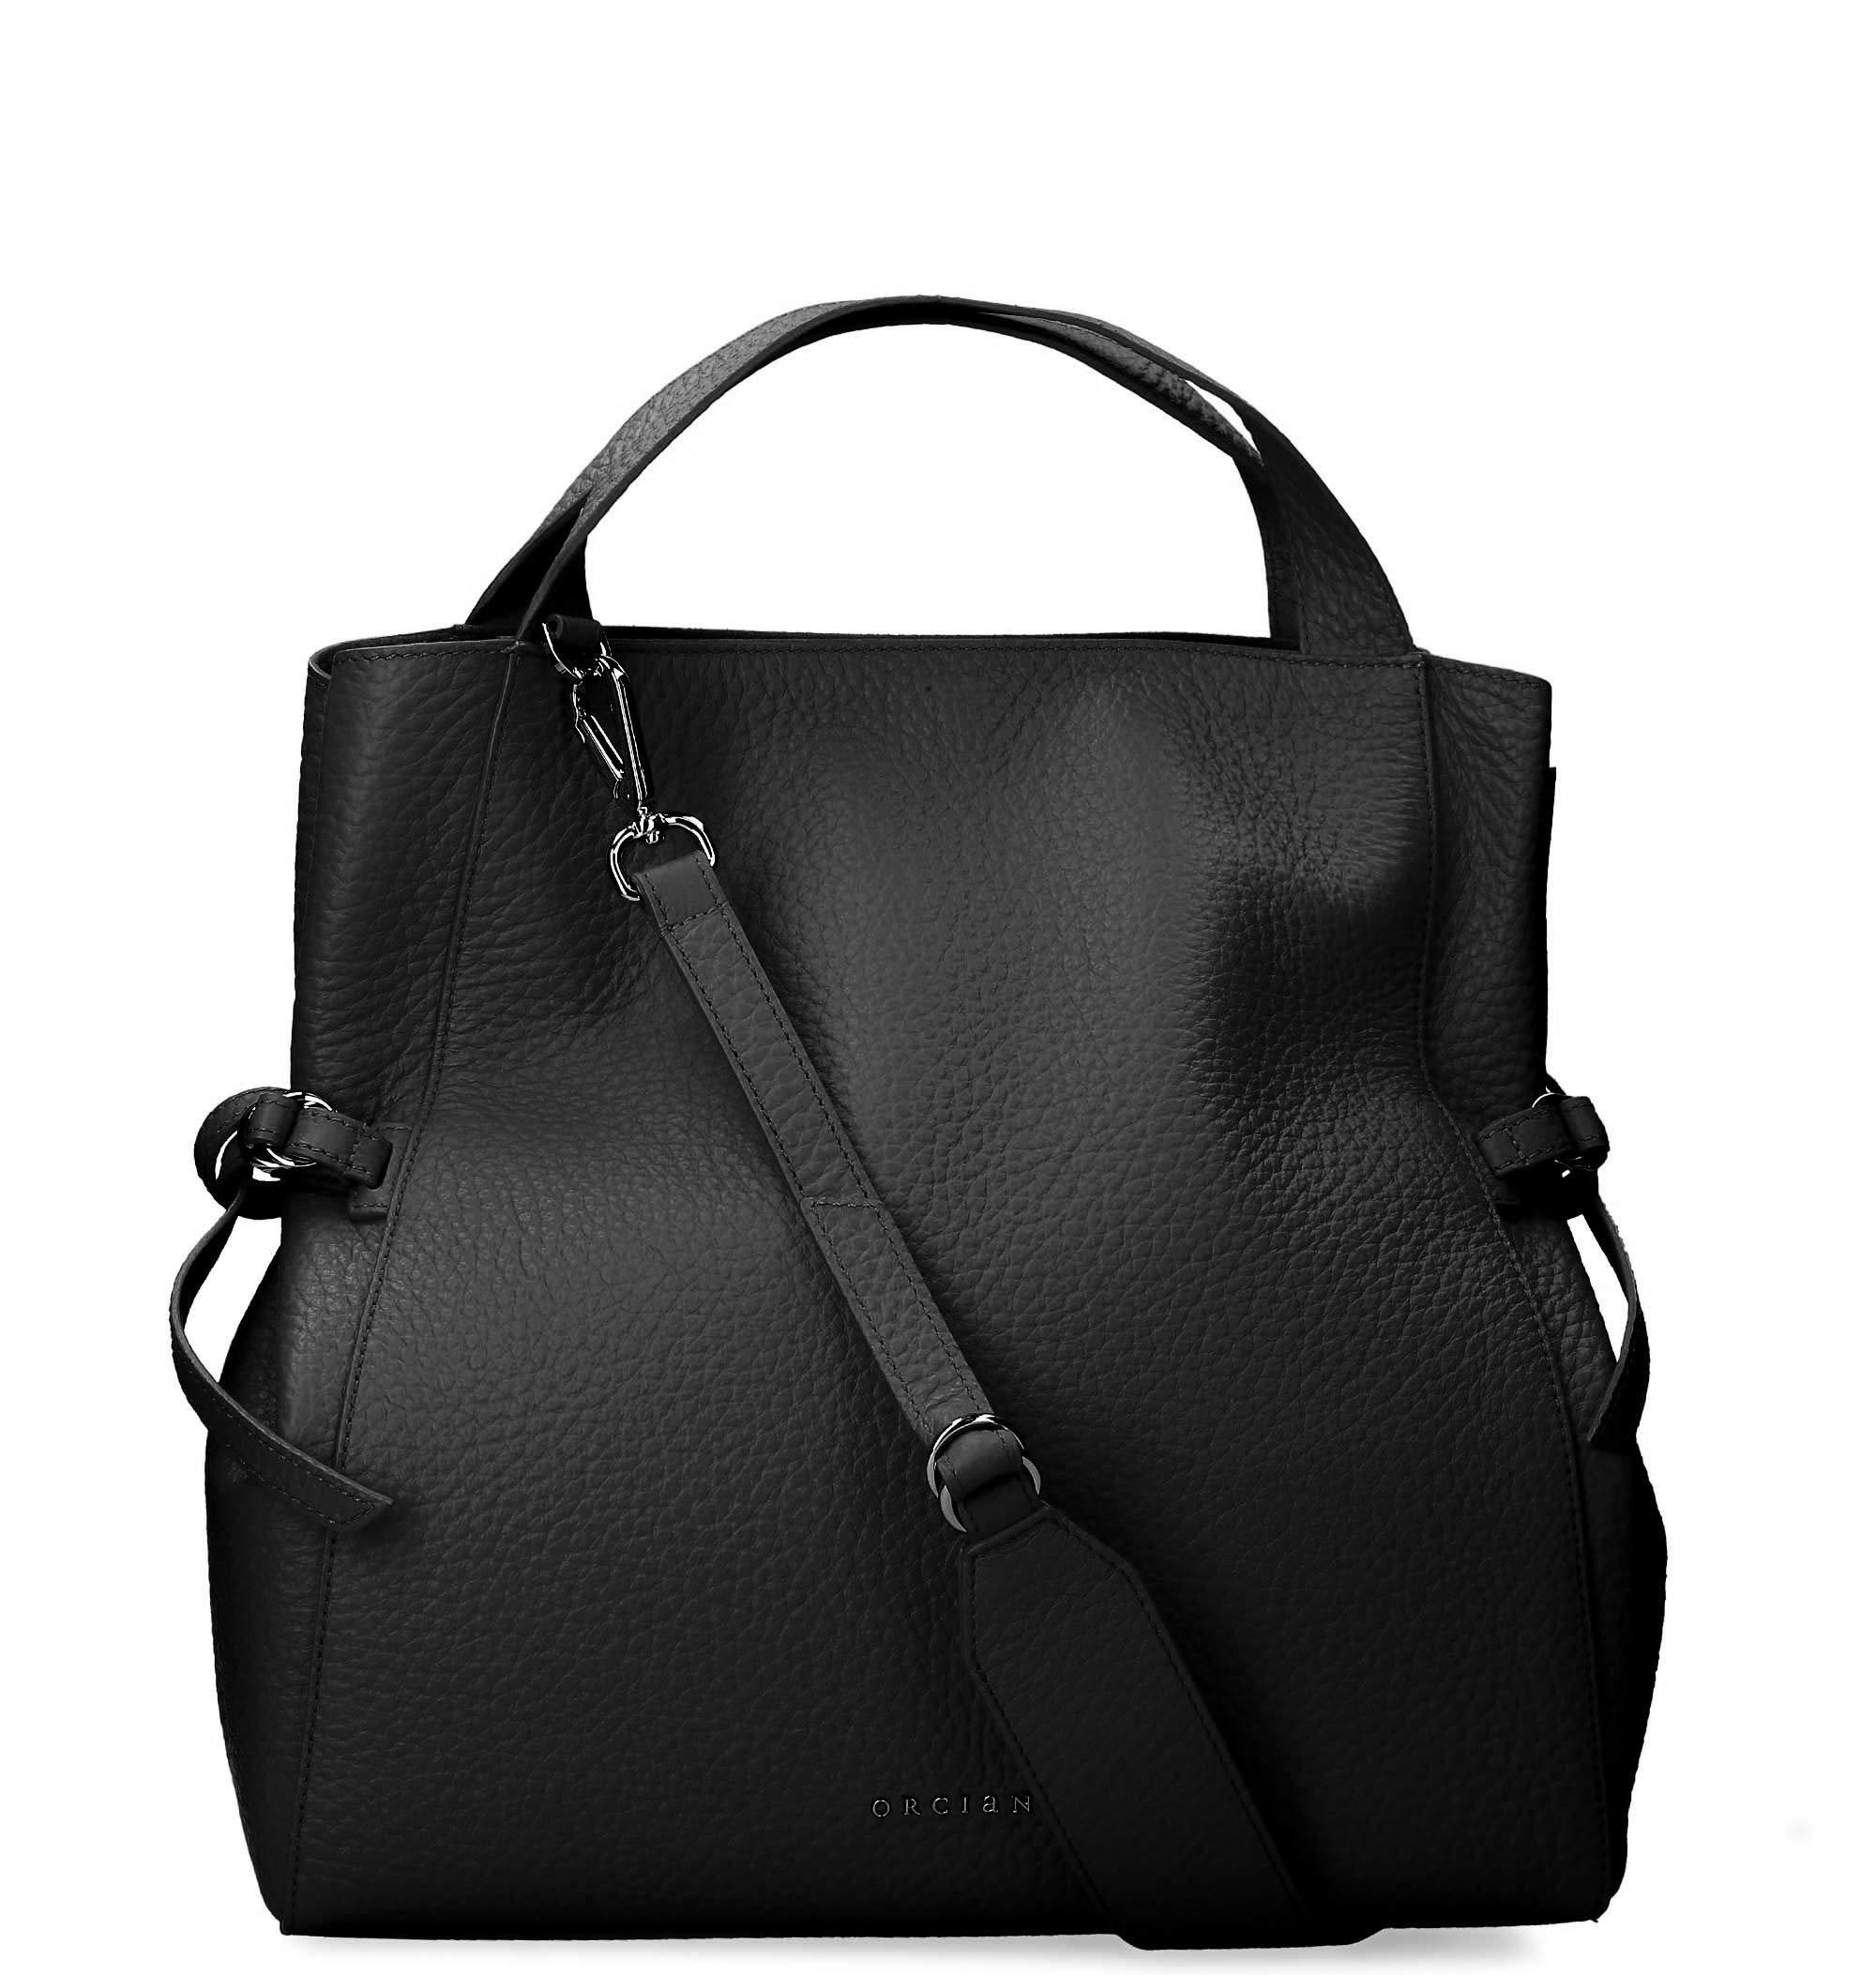 Orciani Women's B02047softnero Black Leather Tote